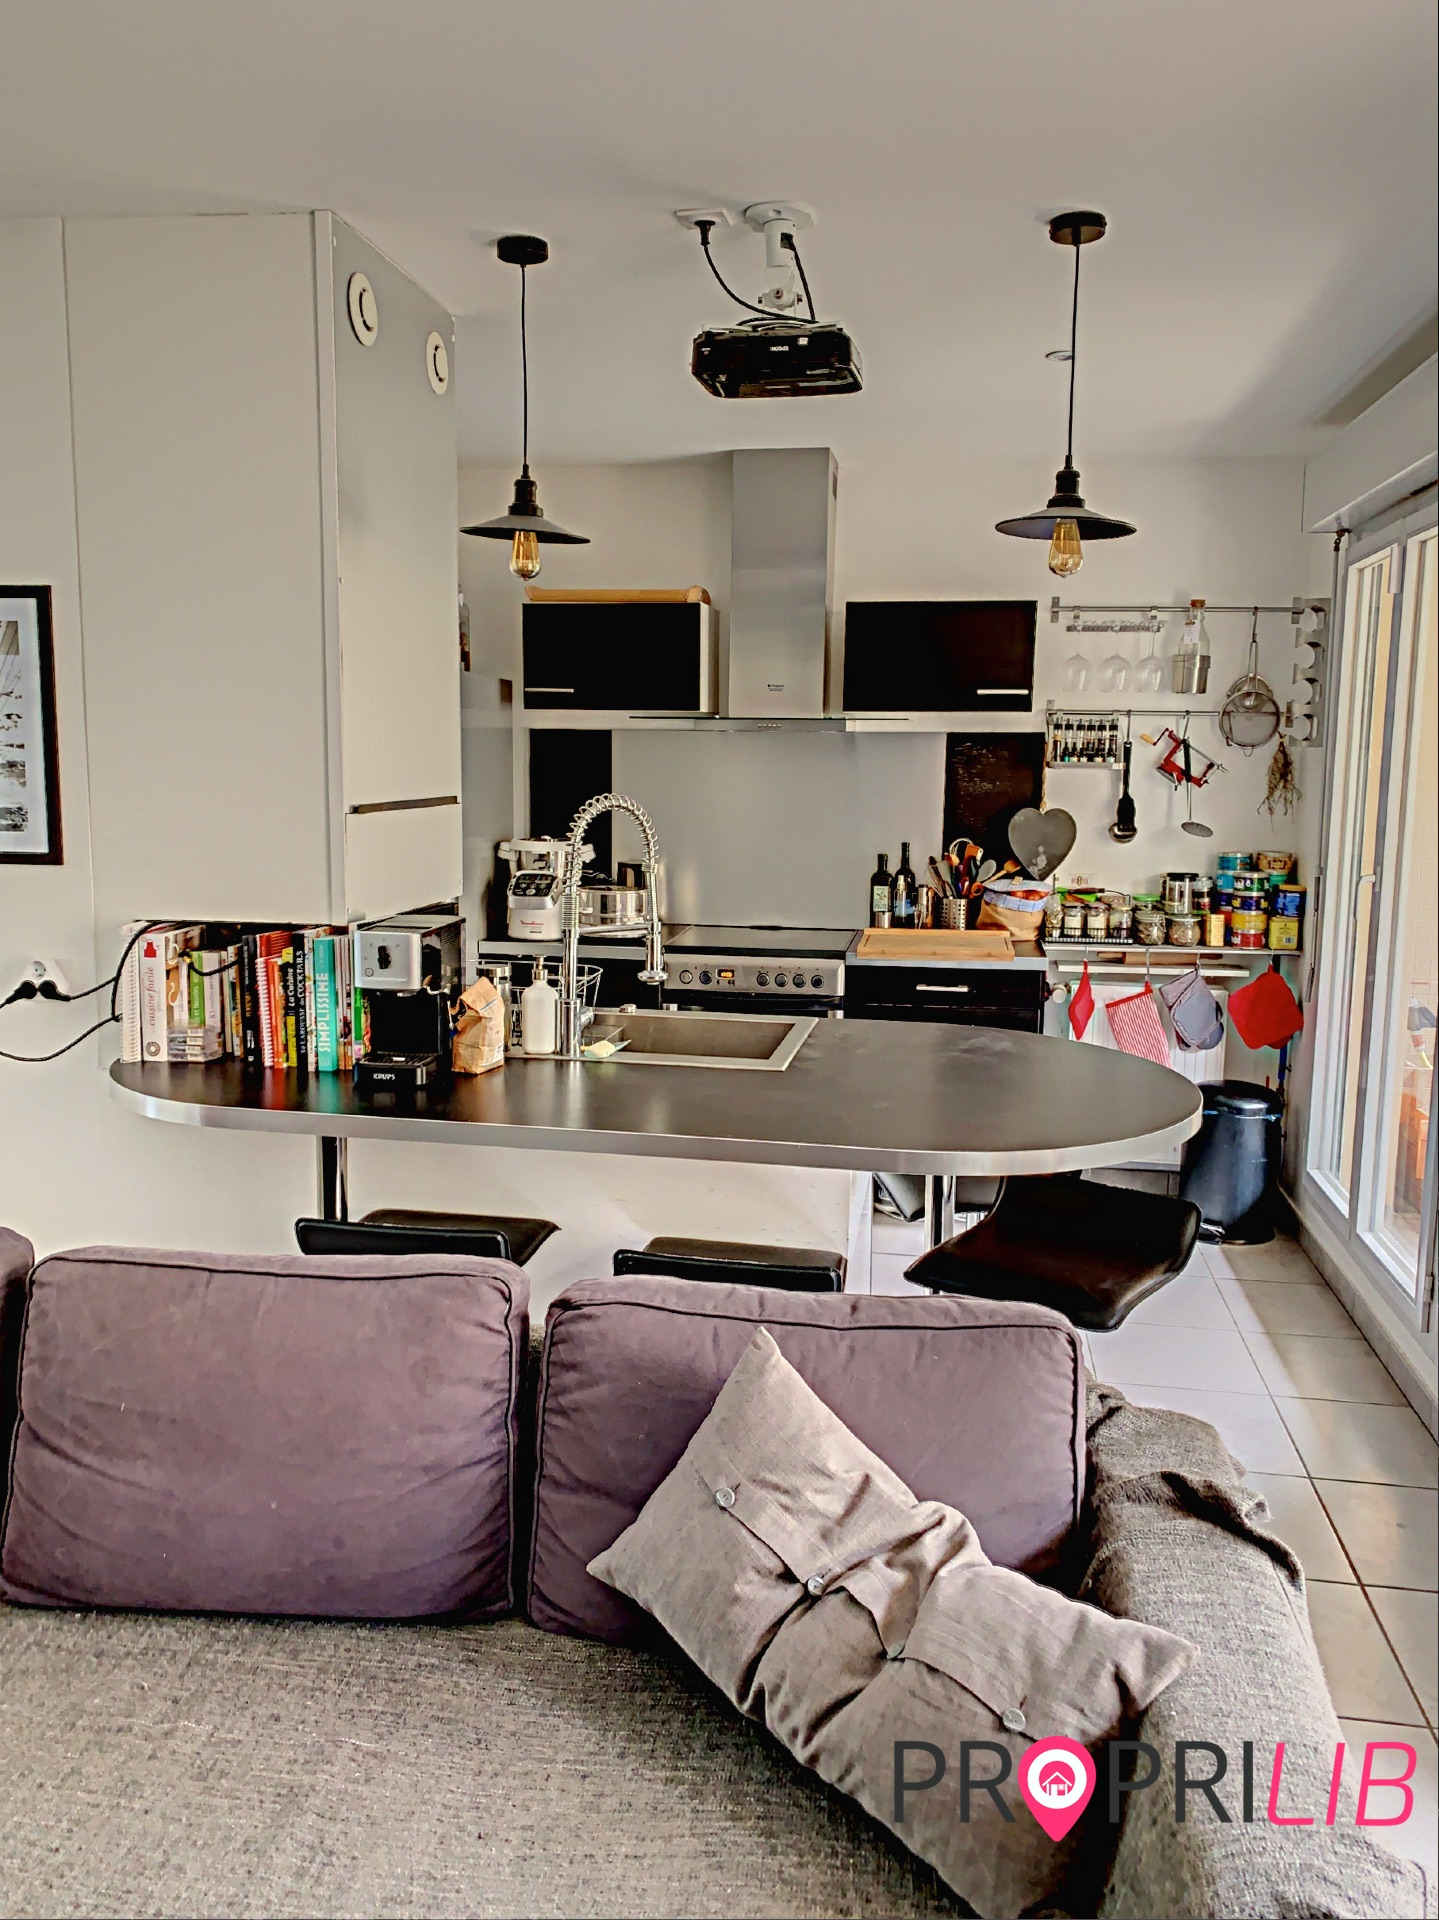 croix-rousse-immobilier-appartement